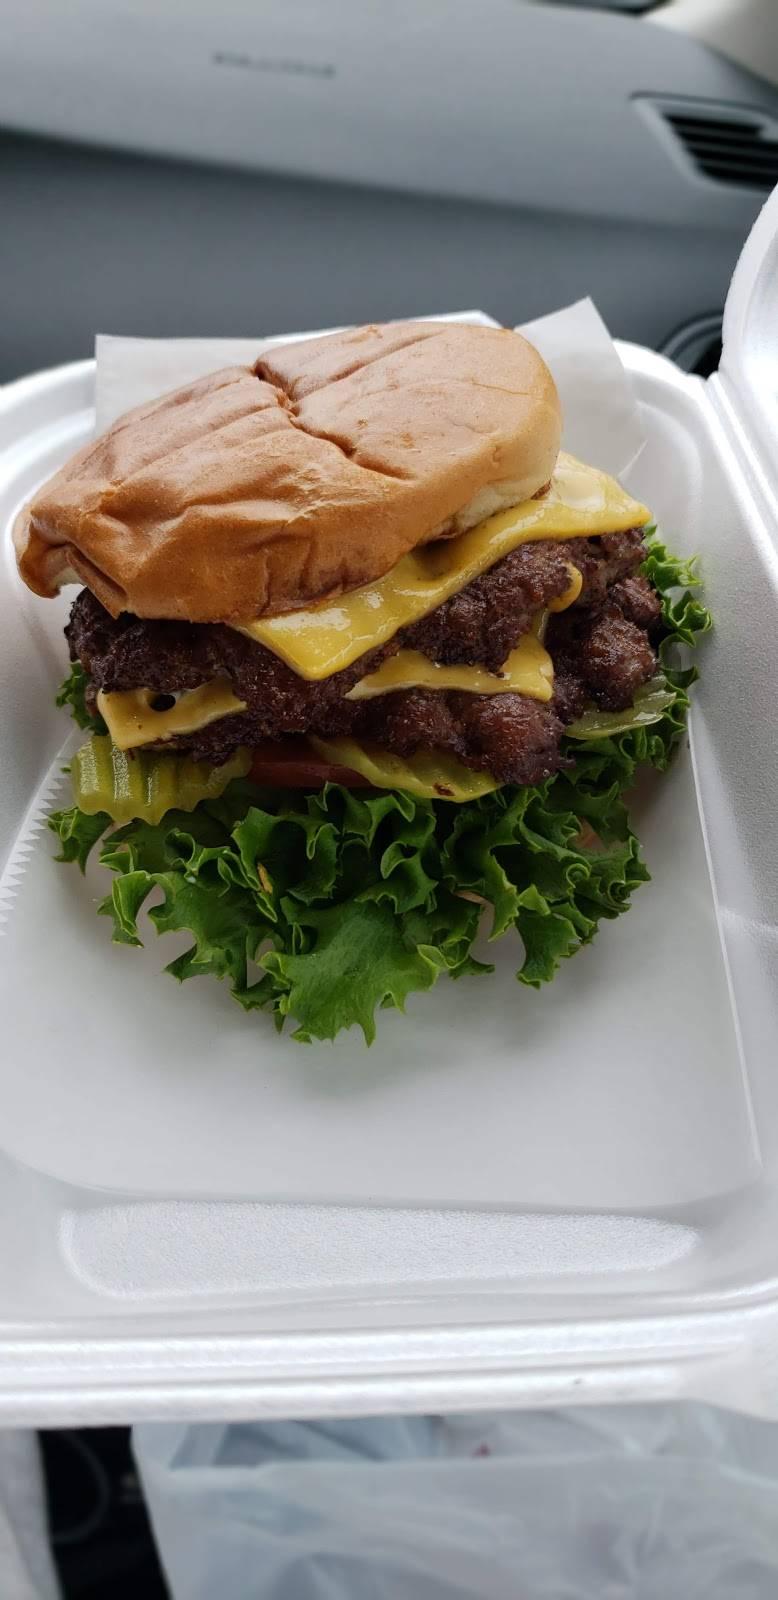 SMACKERS   restaurant   1525 Airways Blvd, Memphis, TN 38114, USA   9013082556 OR +1 901-308-2556